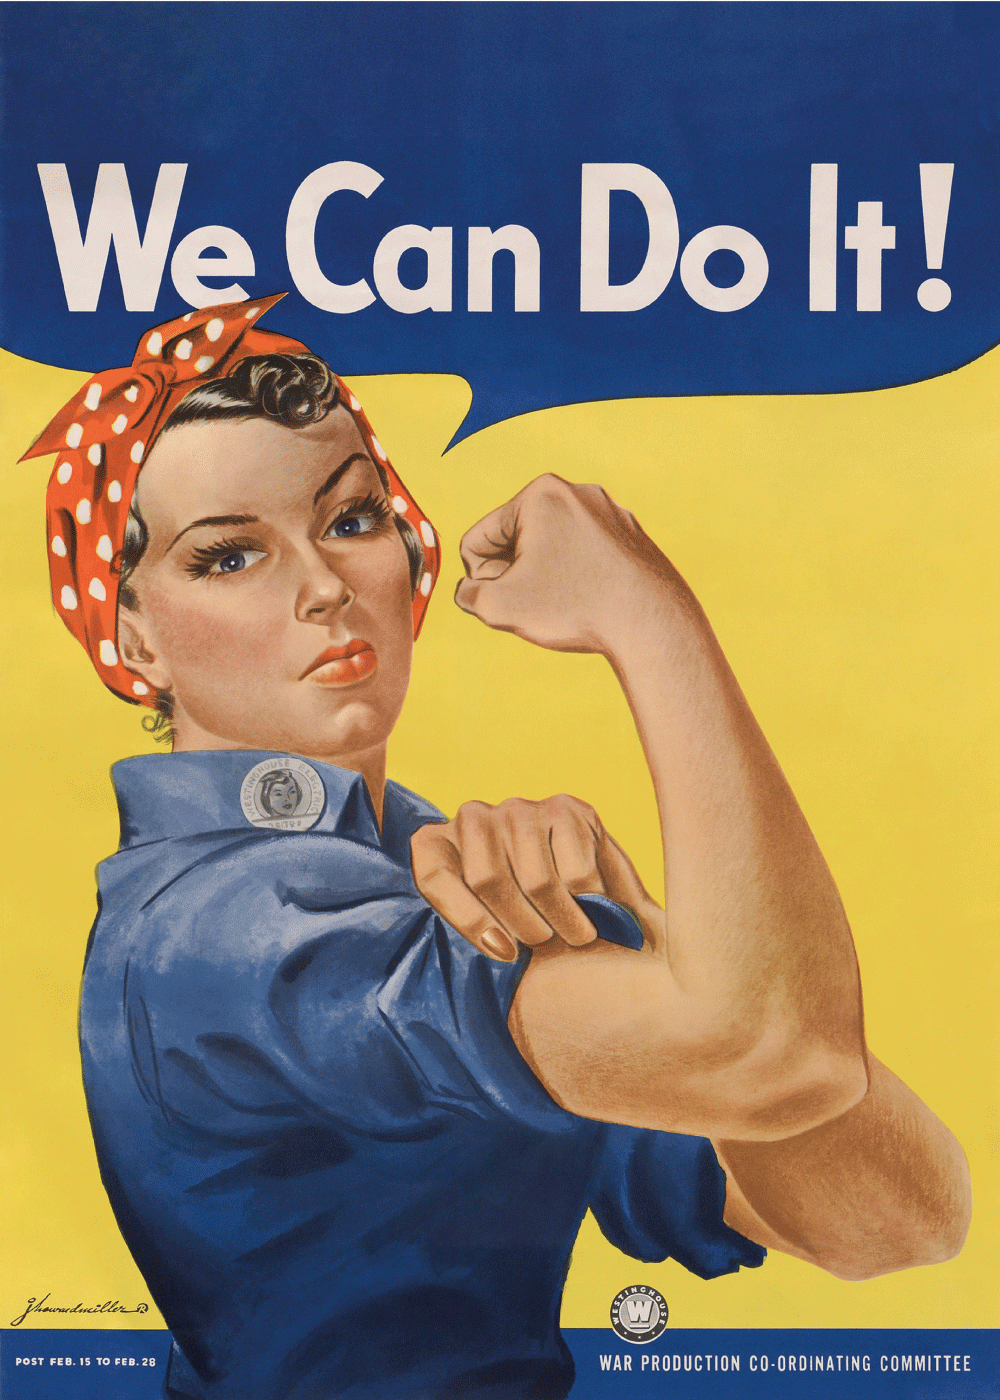 We can do it - Retro plakat